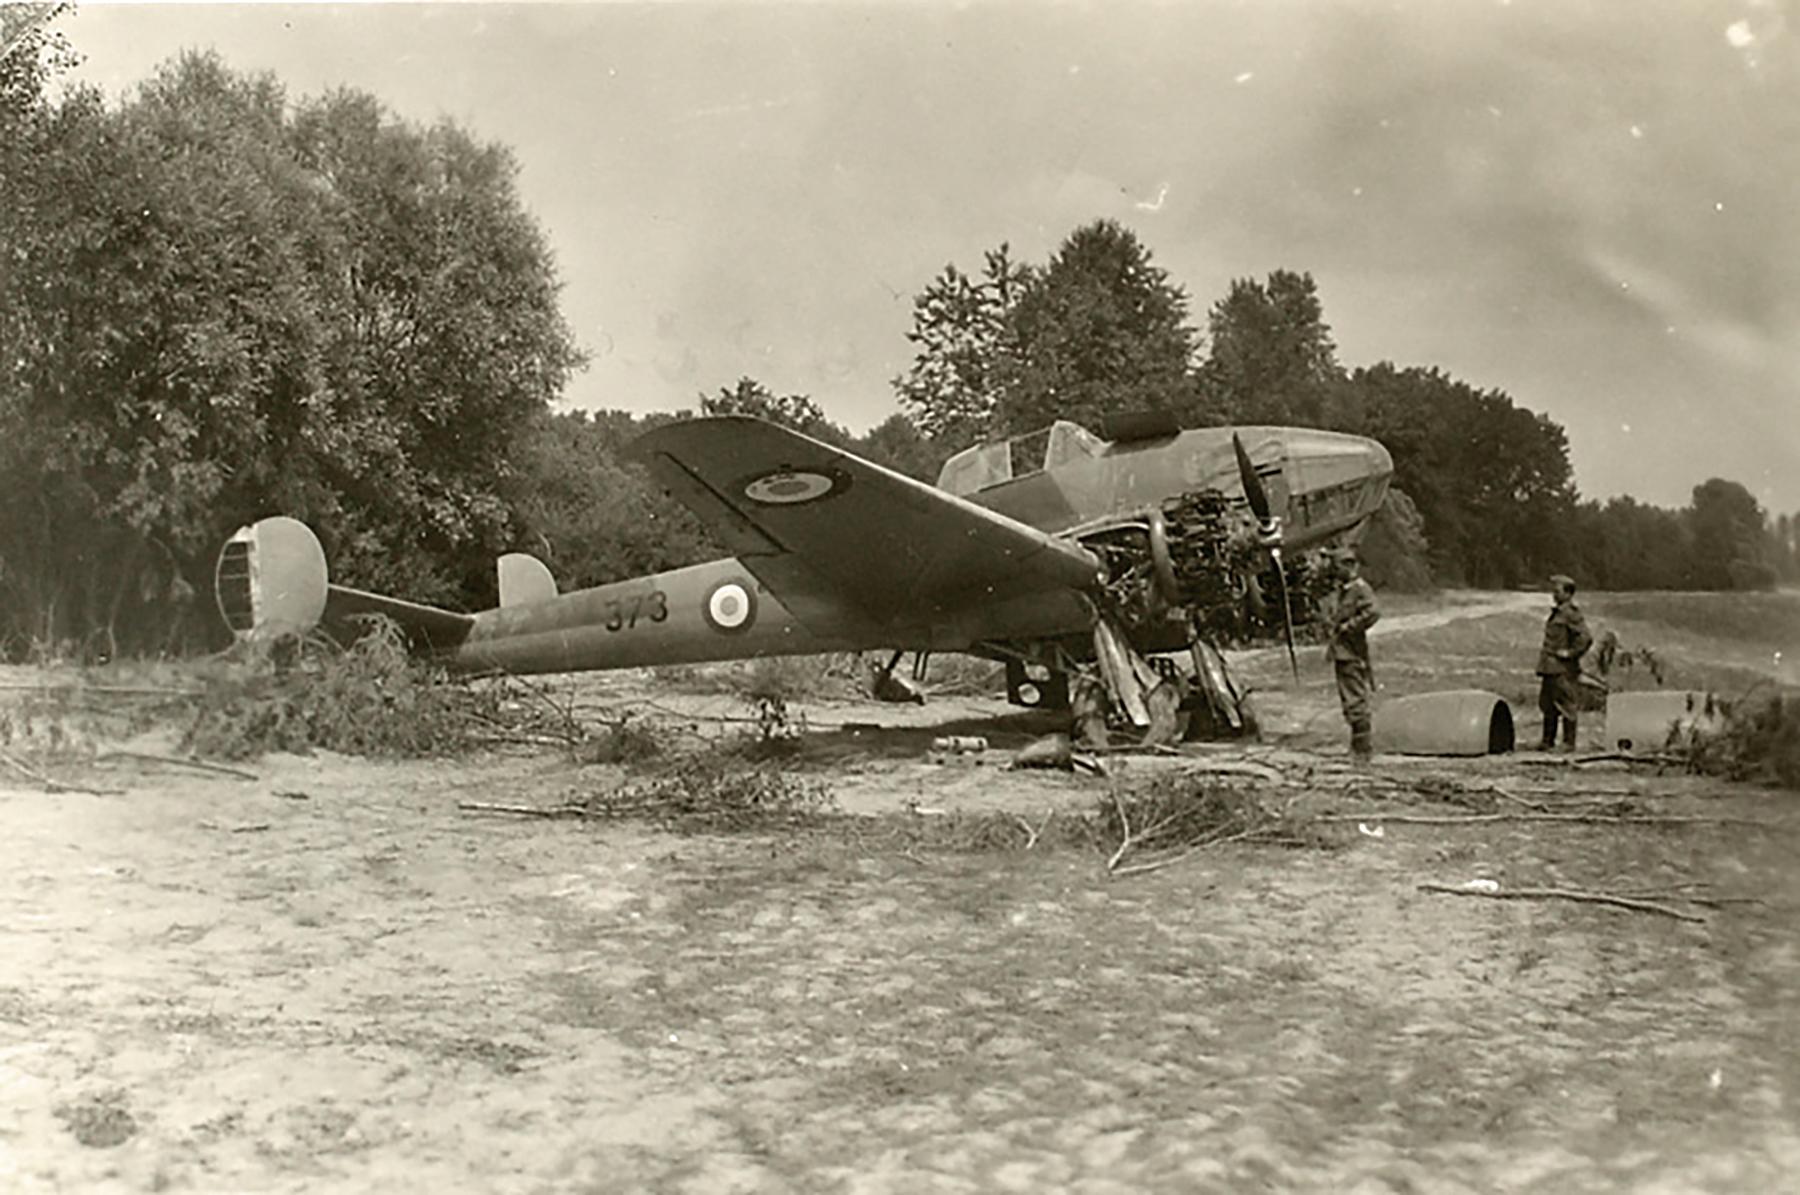 French Airforce Potez 63.11 Black 373 captured during the battle of France 1940 ebay 01